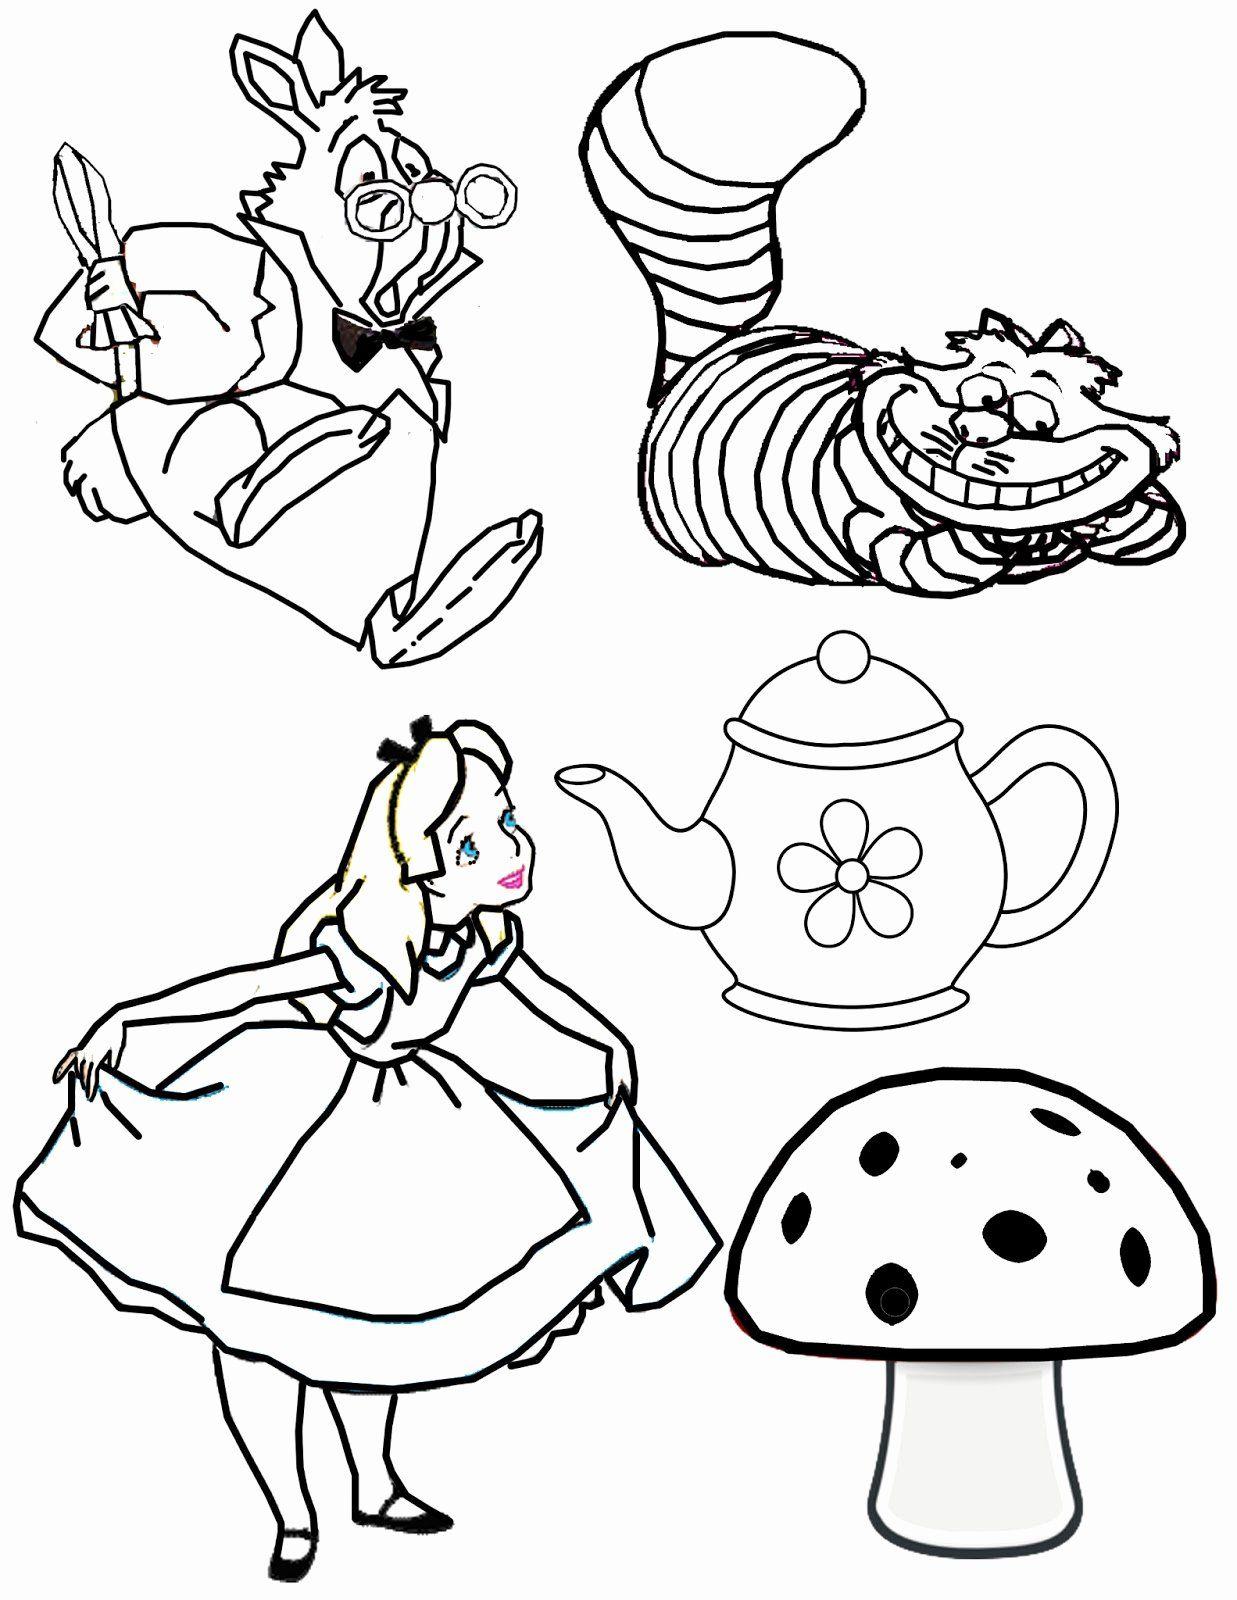 Nice Alice In The Wonderland Walking Man Coloring Page Dibujos Tutorial De Dibujo Dibujos Bonitos